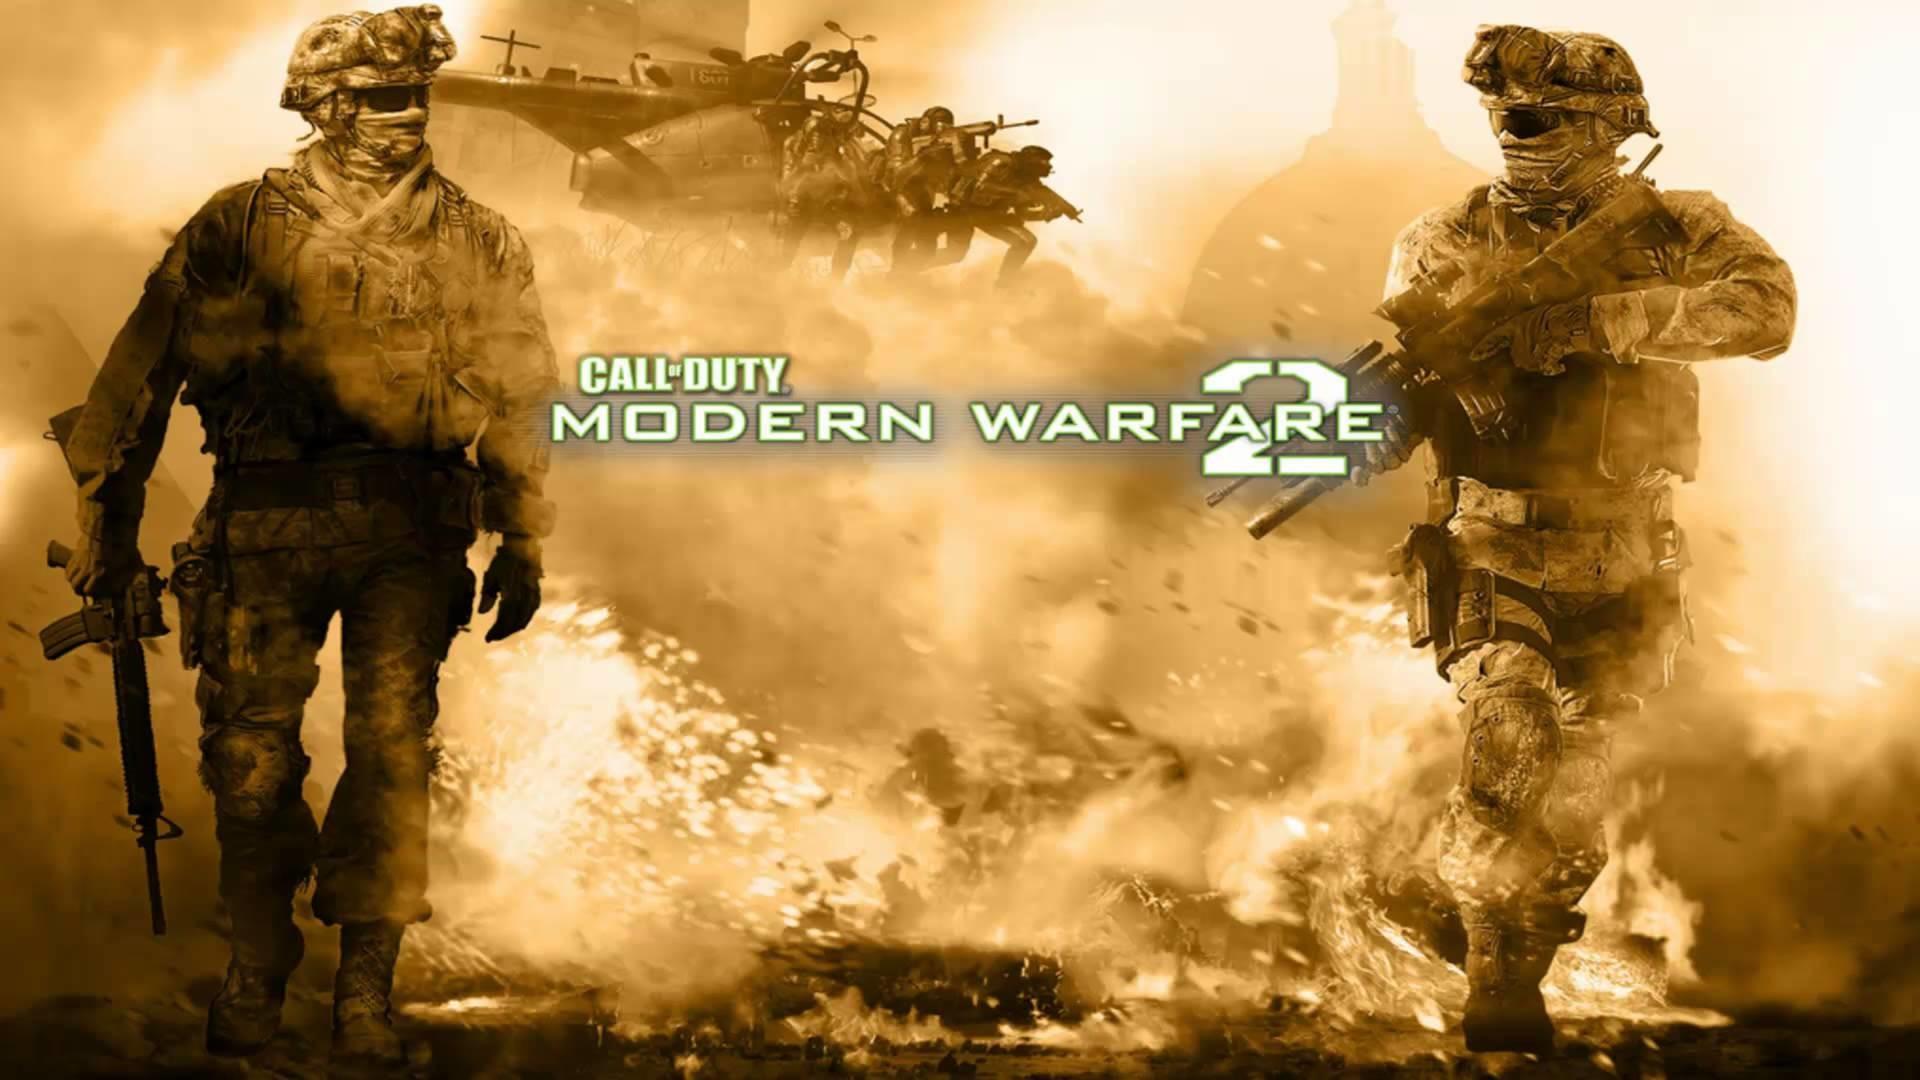 31 Call Of Duty: Modern Warfare 2 HD Wallpapers | Backgrounds